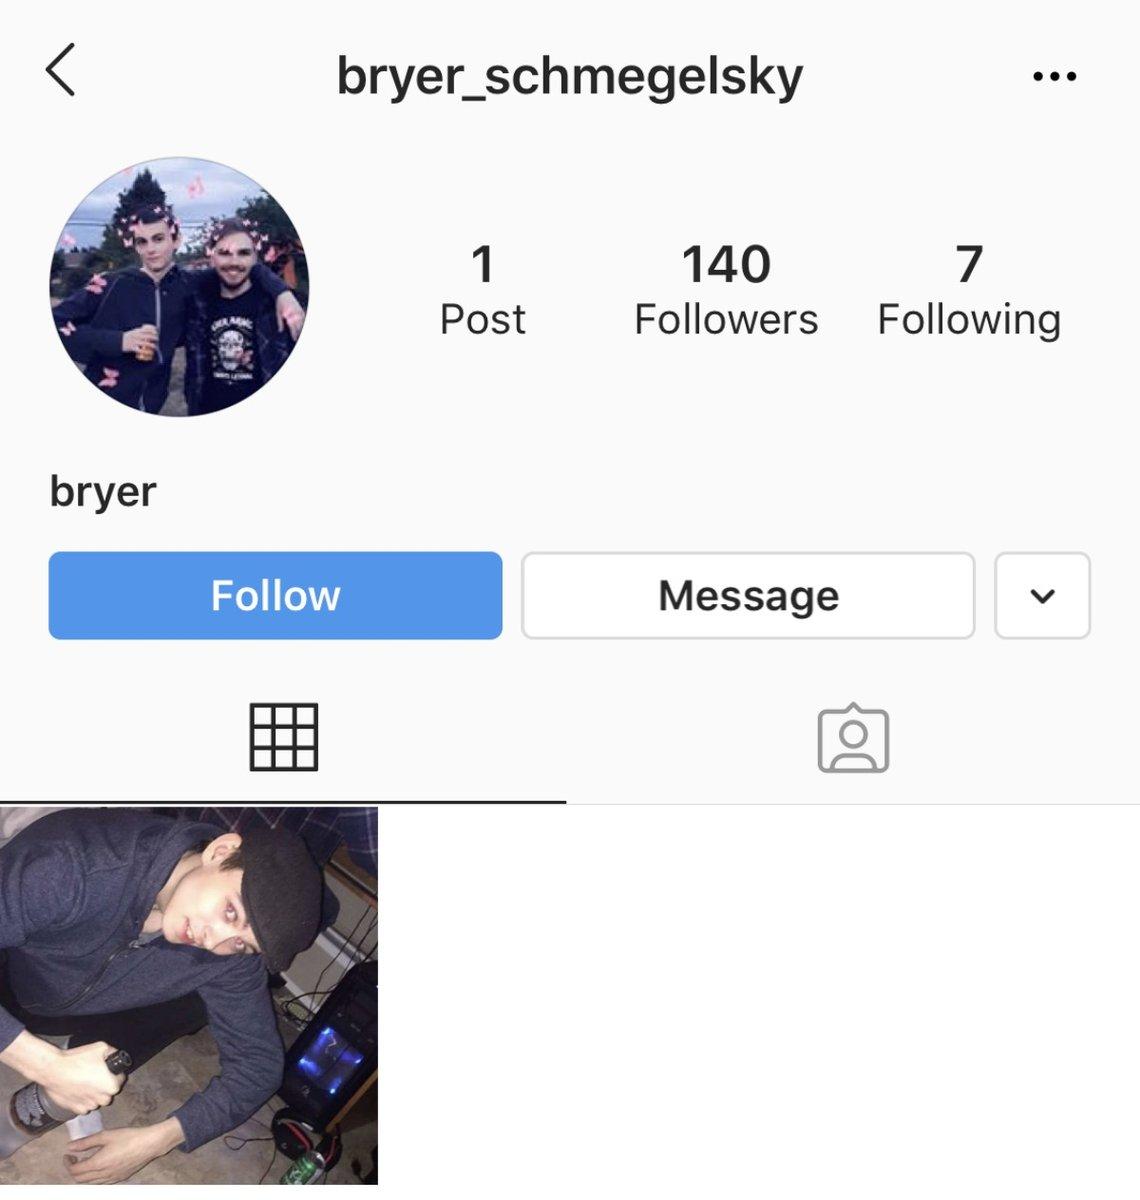 bryer schmegelsky instagram